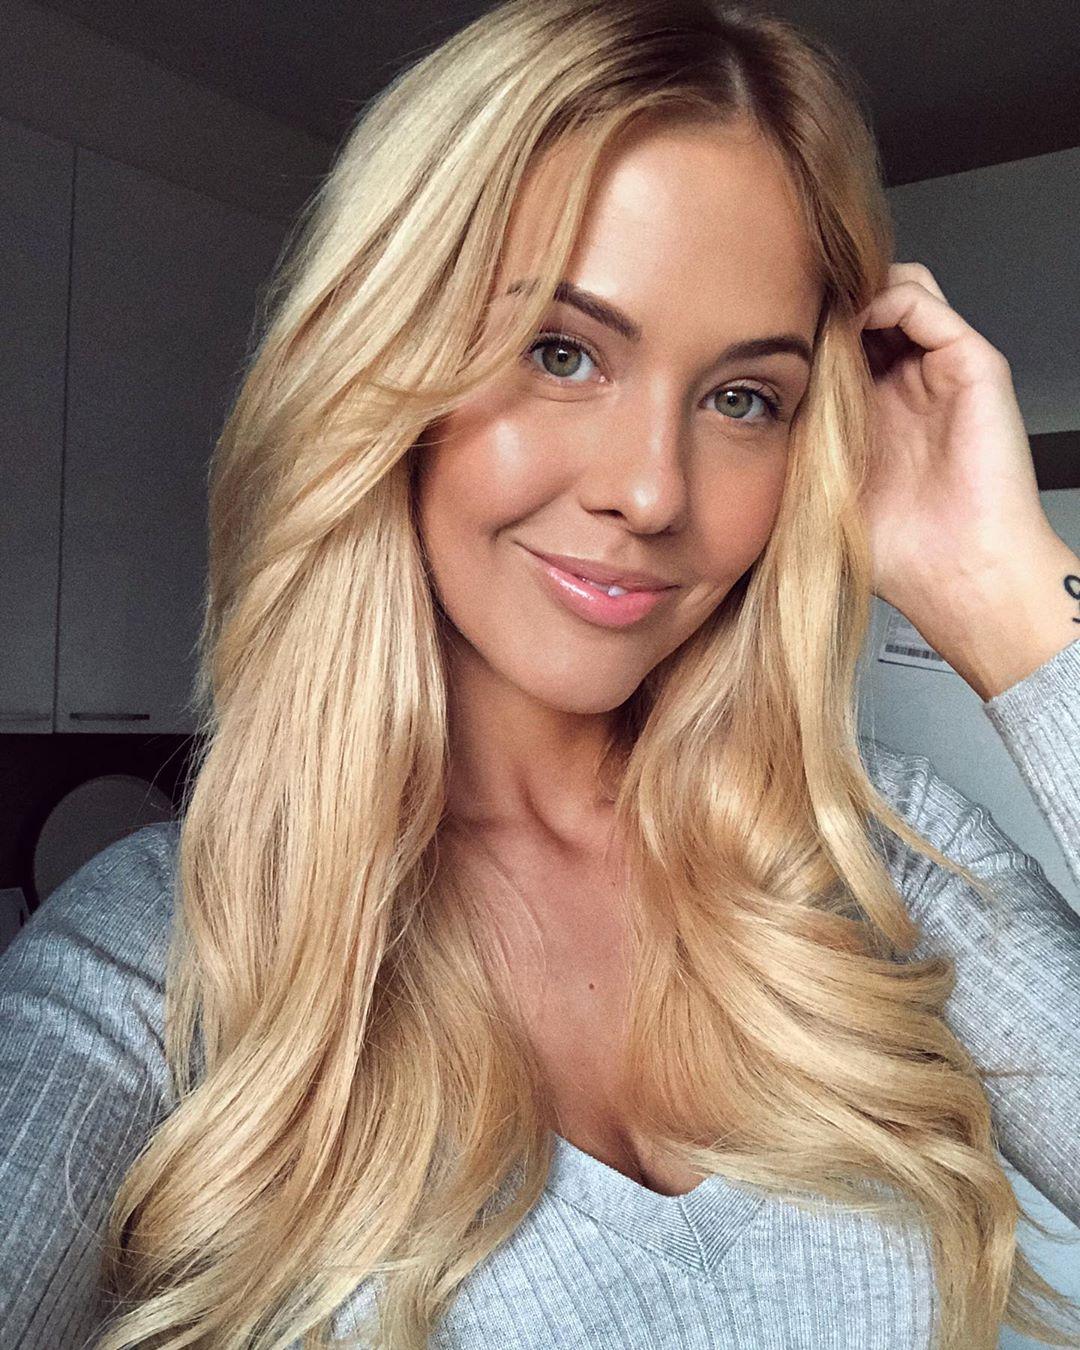 Finnish Girls